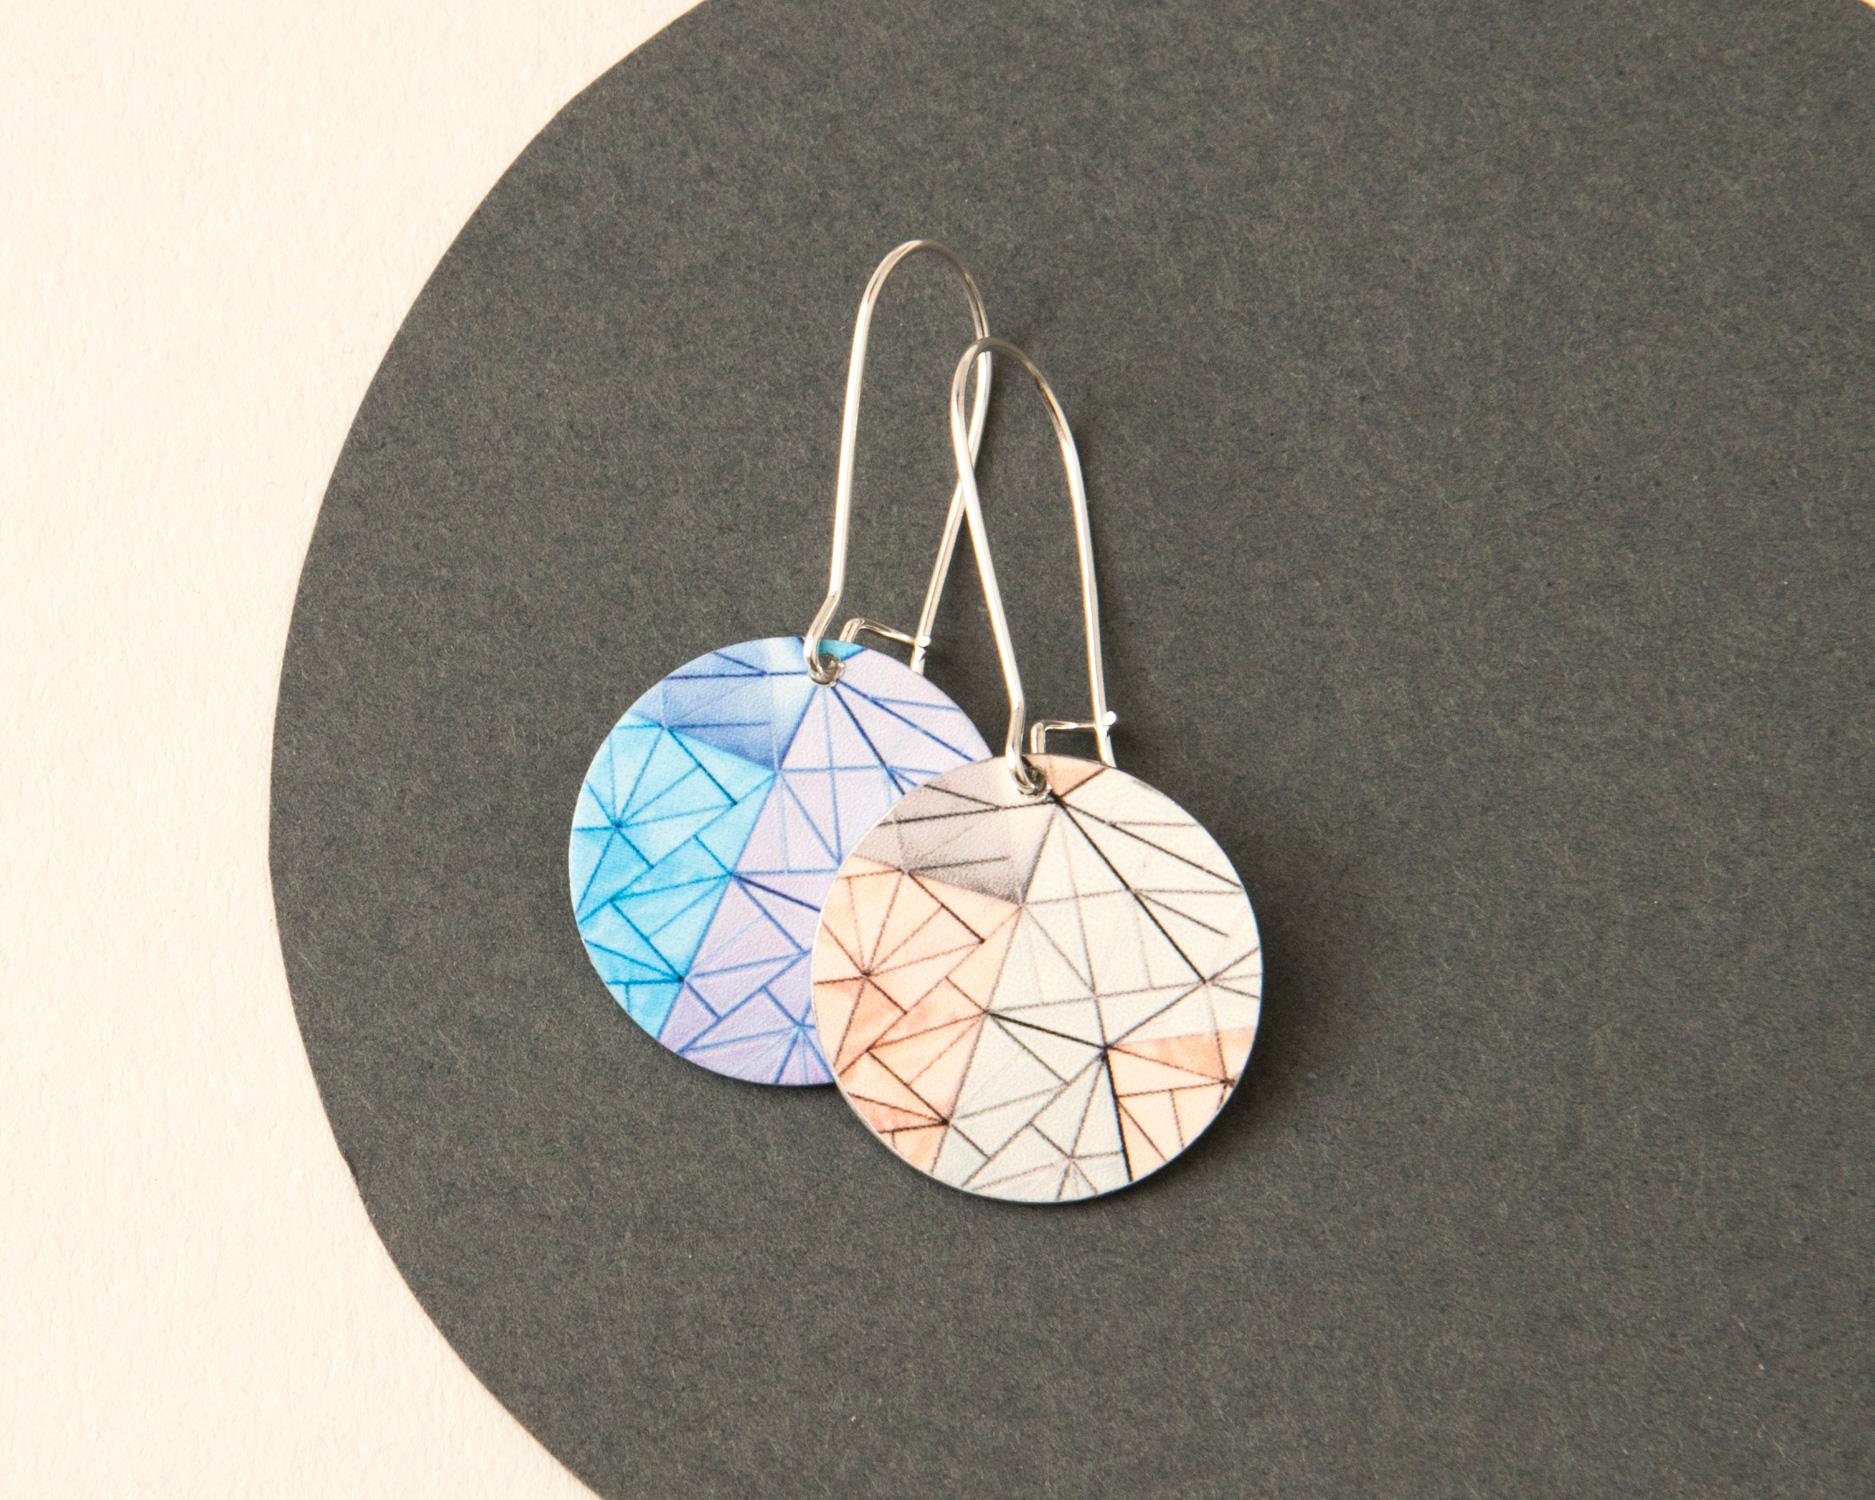 New Melbourne inspired jewellery range